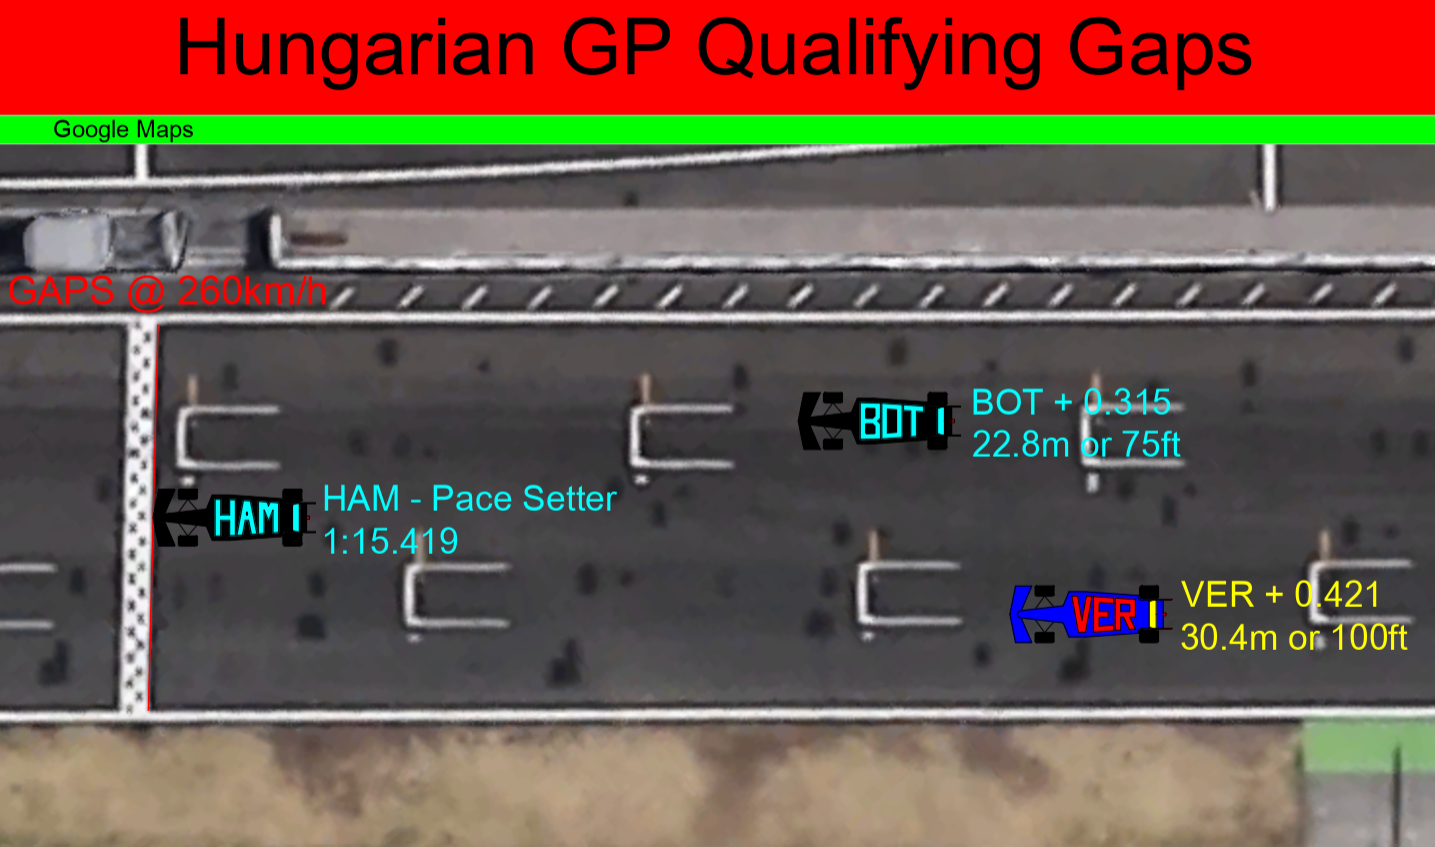 Qualifying - Graphic - Gaps